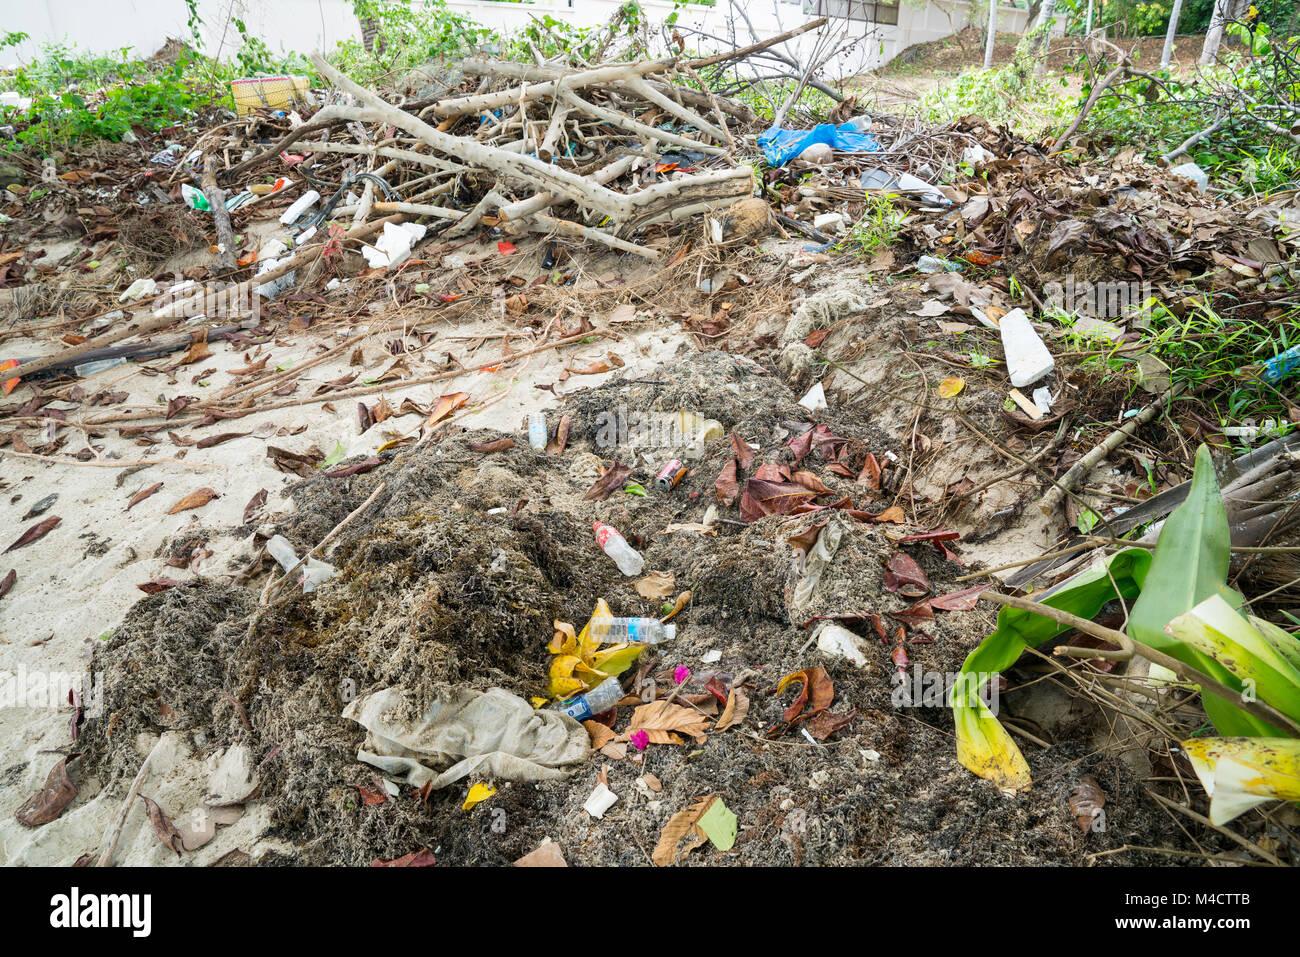 KO SAMUI, THAILAND - JANUARY, 25, 2018; mixture of biodegragable and non biodegradable environmental waste and rubbish - Stock Image